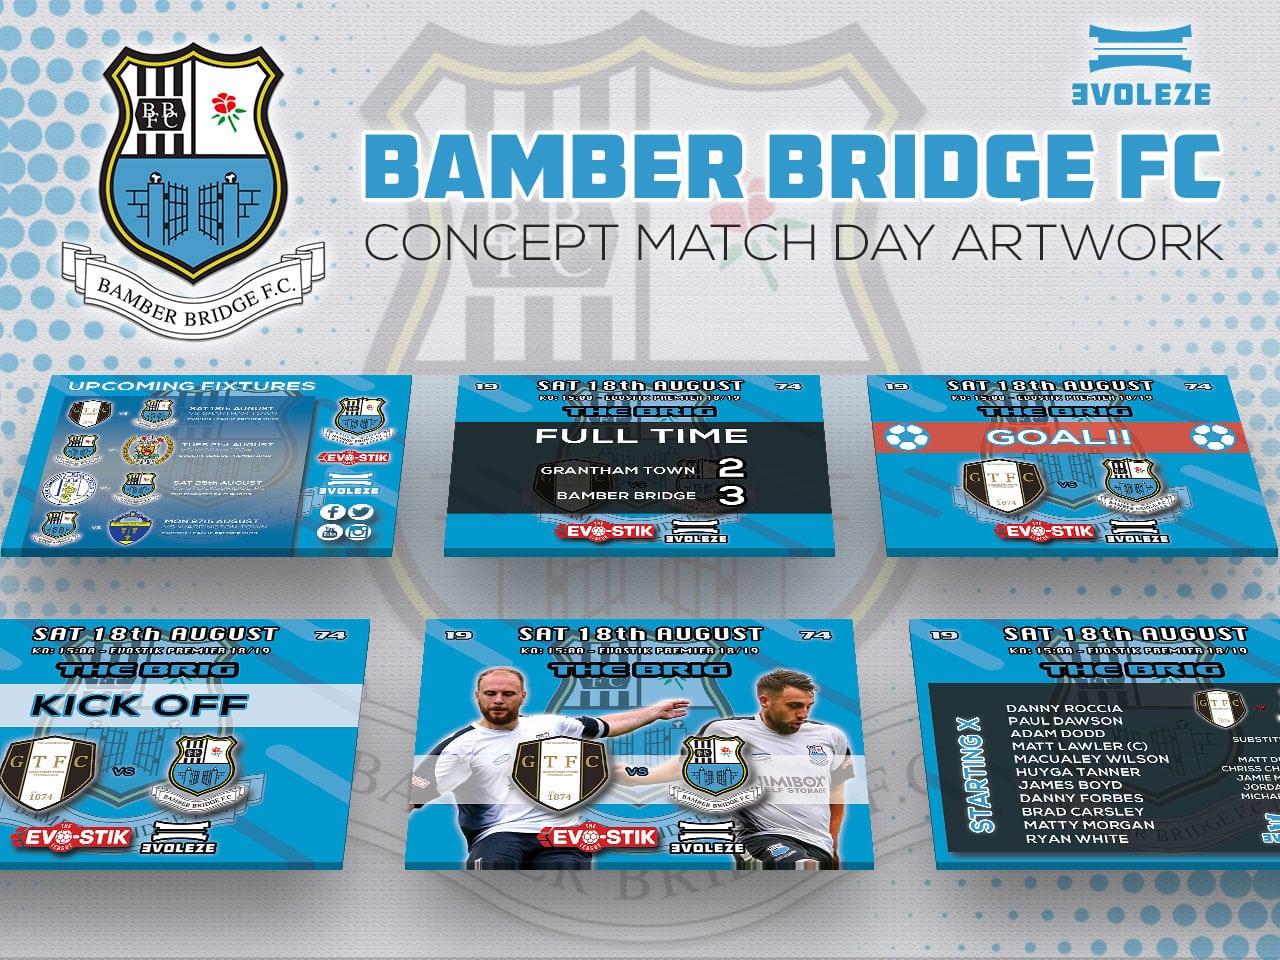 bamber bridge FC match day artwork-set